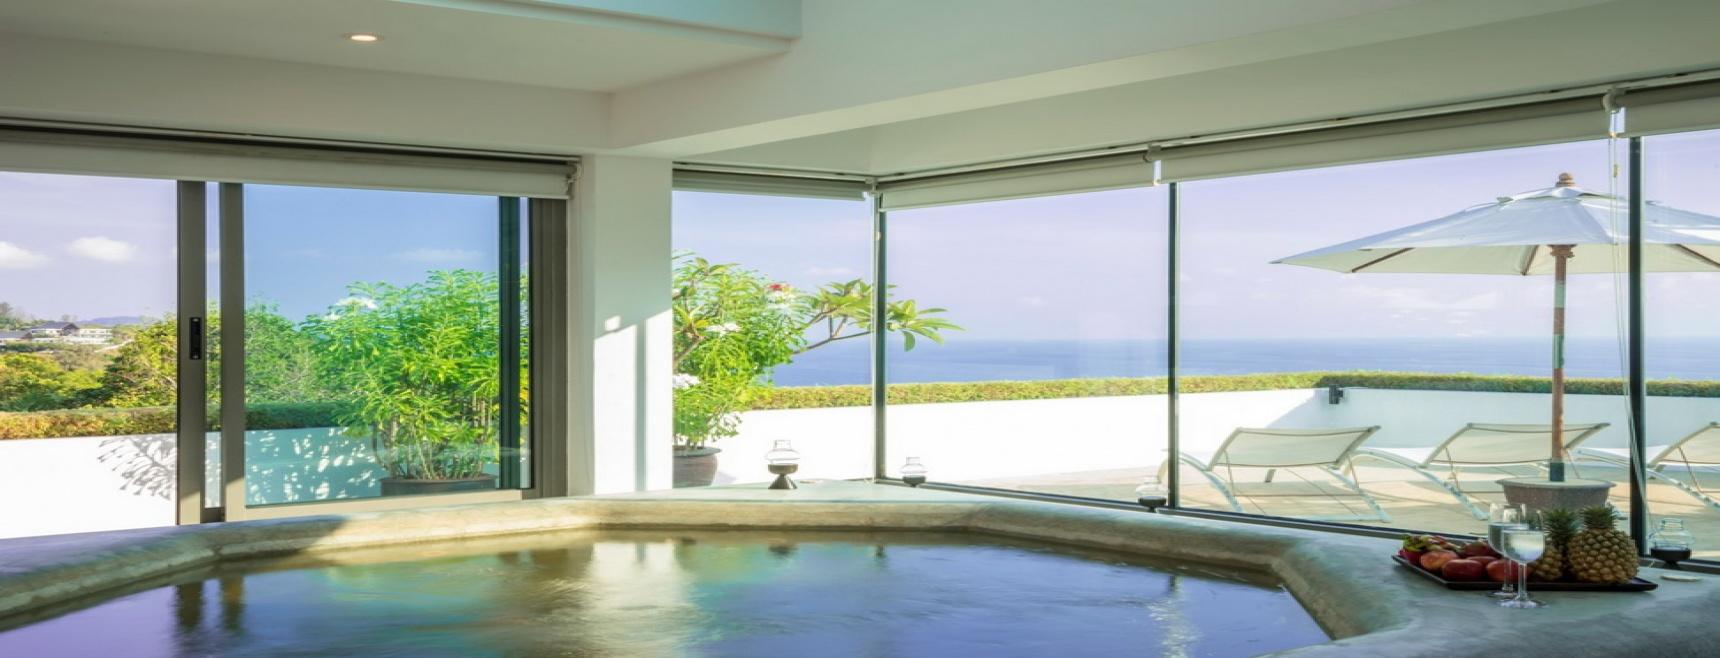 One Waterfall Bay 6 bedroom(Thai-Real.com)